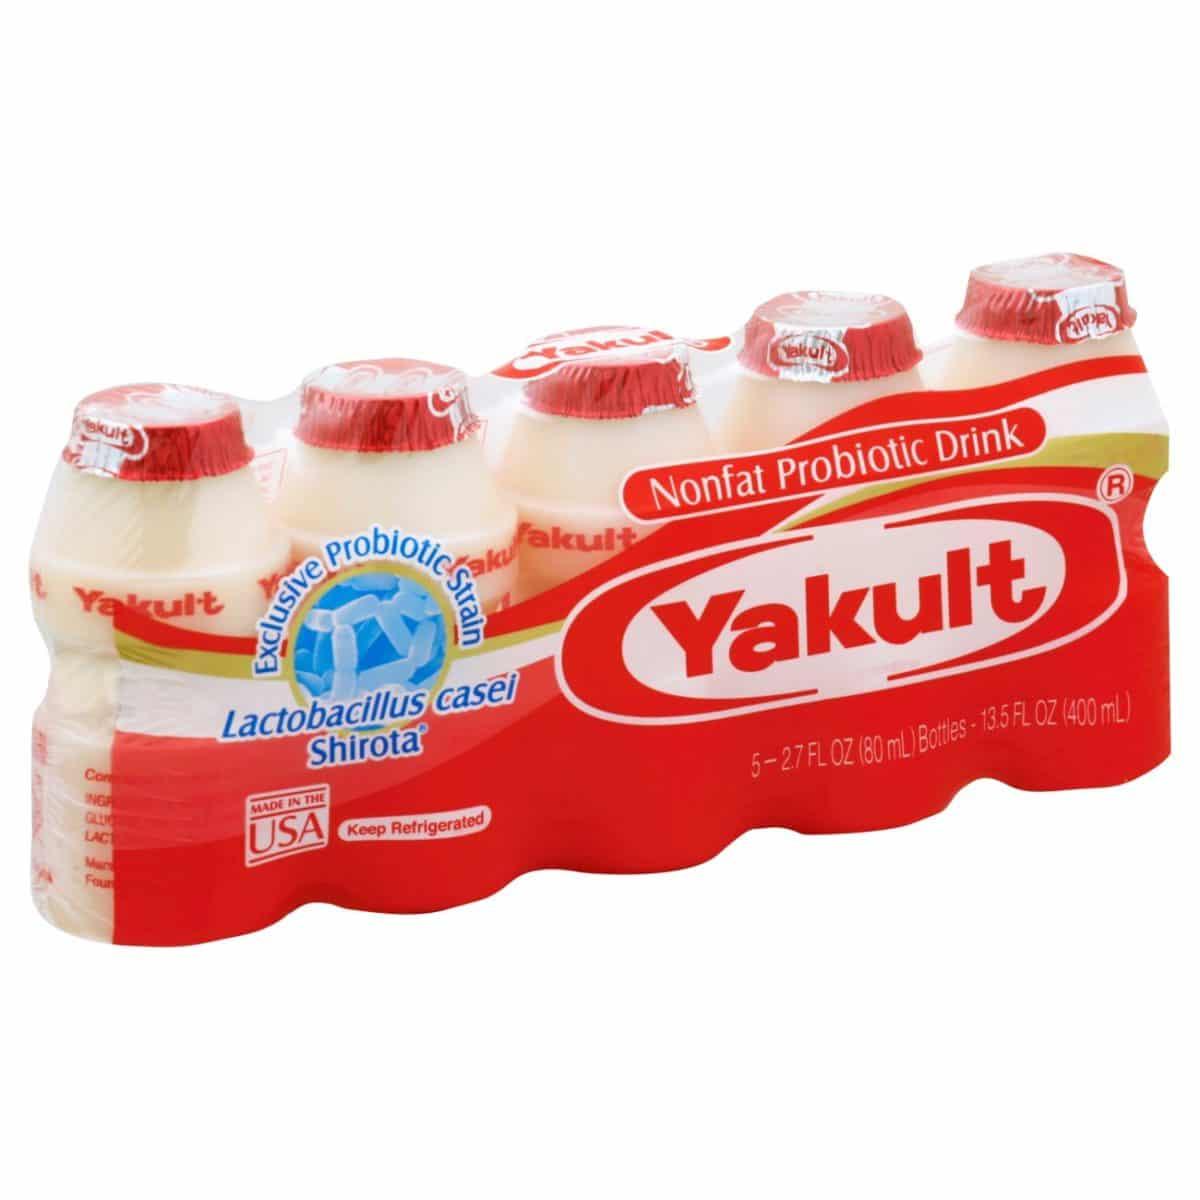 90s snacks australia - yakult